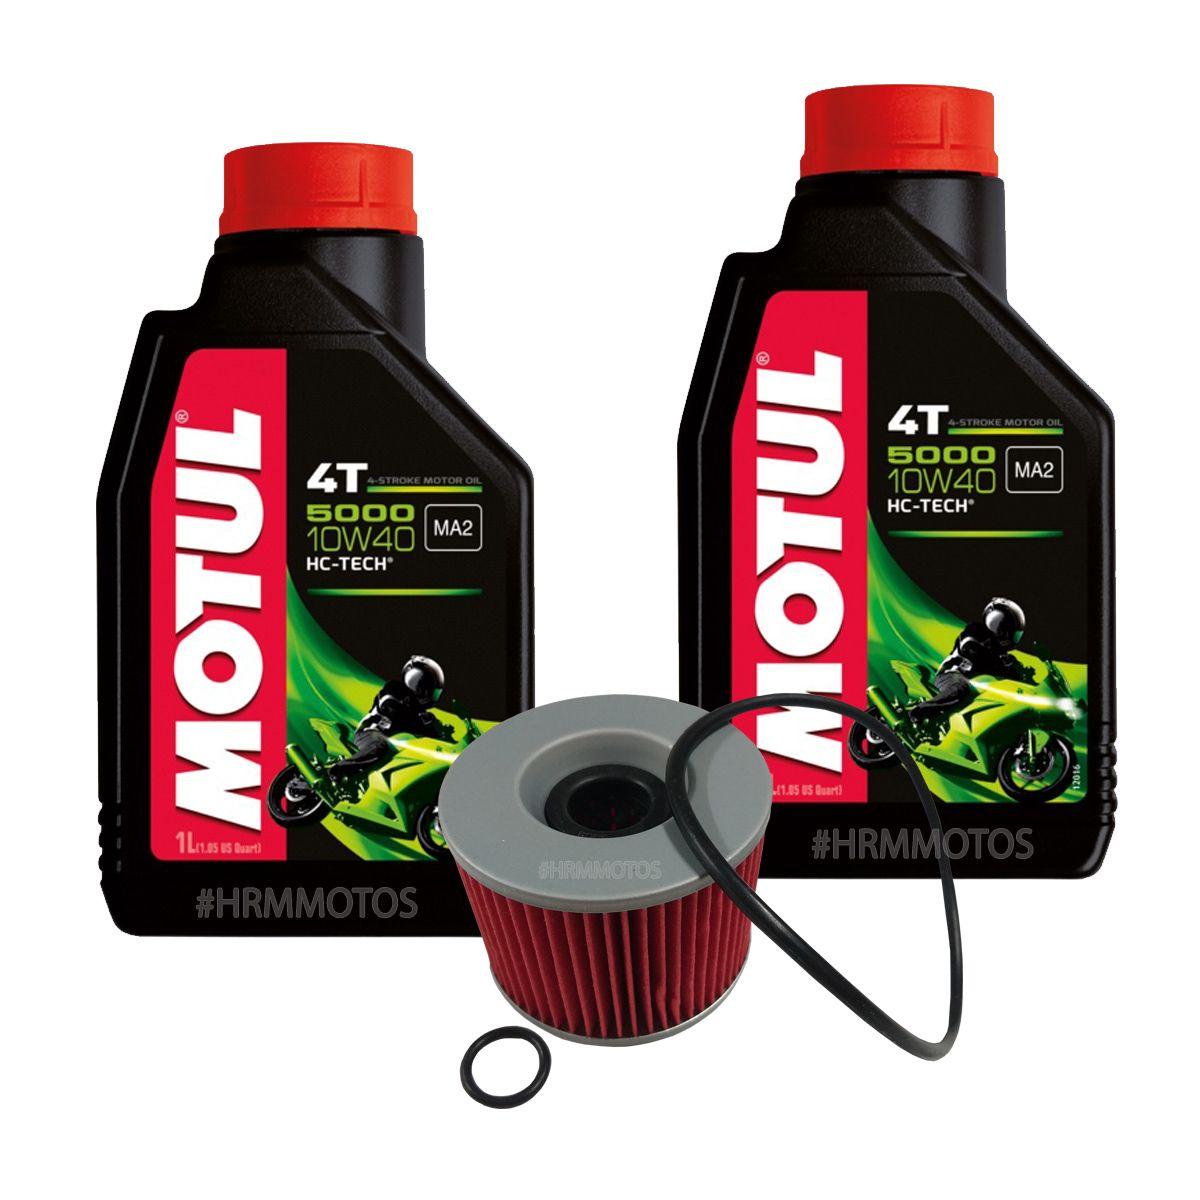 Kit Filtro de Óleo e 2 lts Motul 5000 10w40 Para Ninja 250R c/Anel Vedação